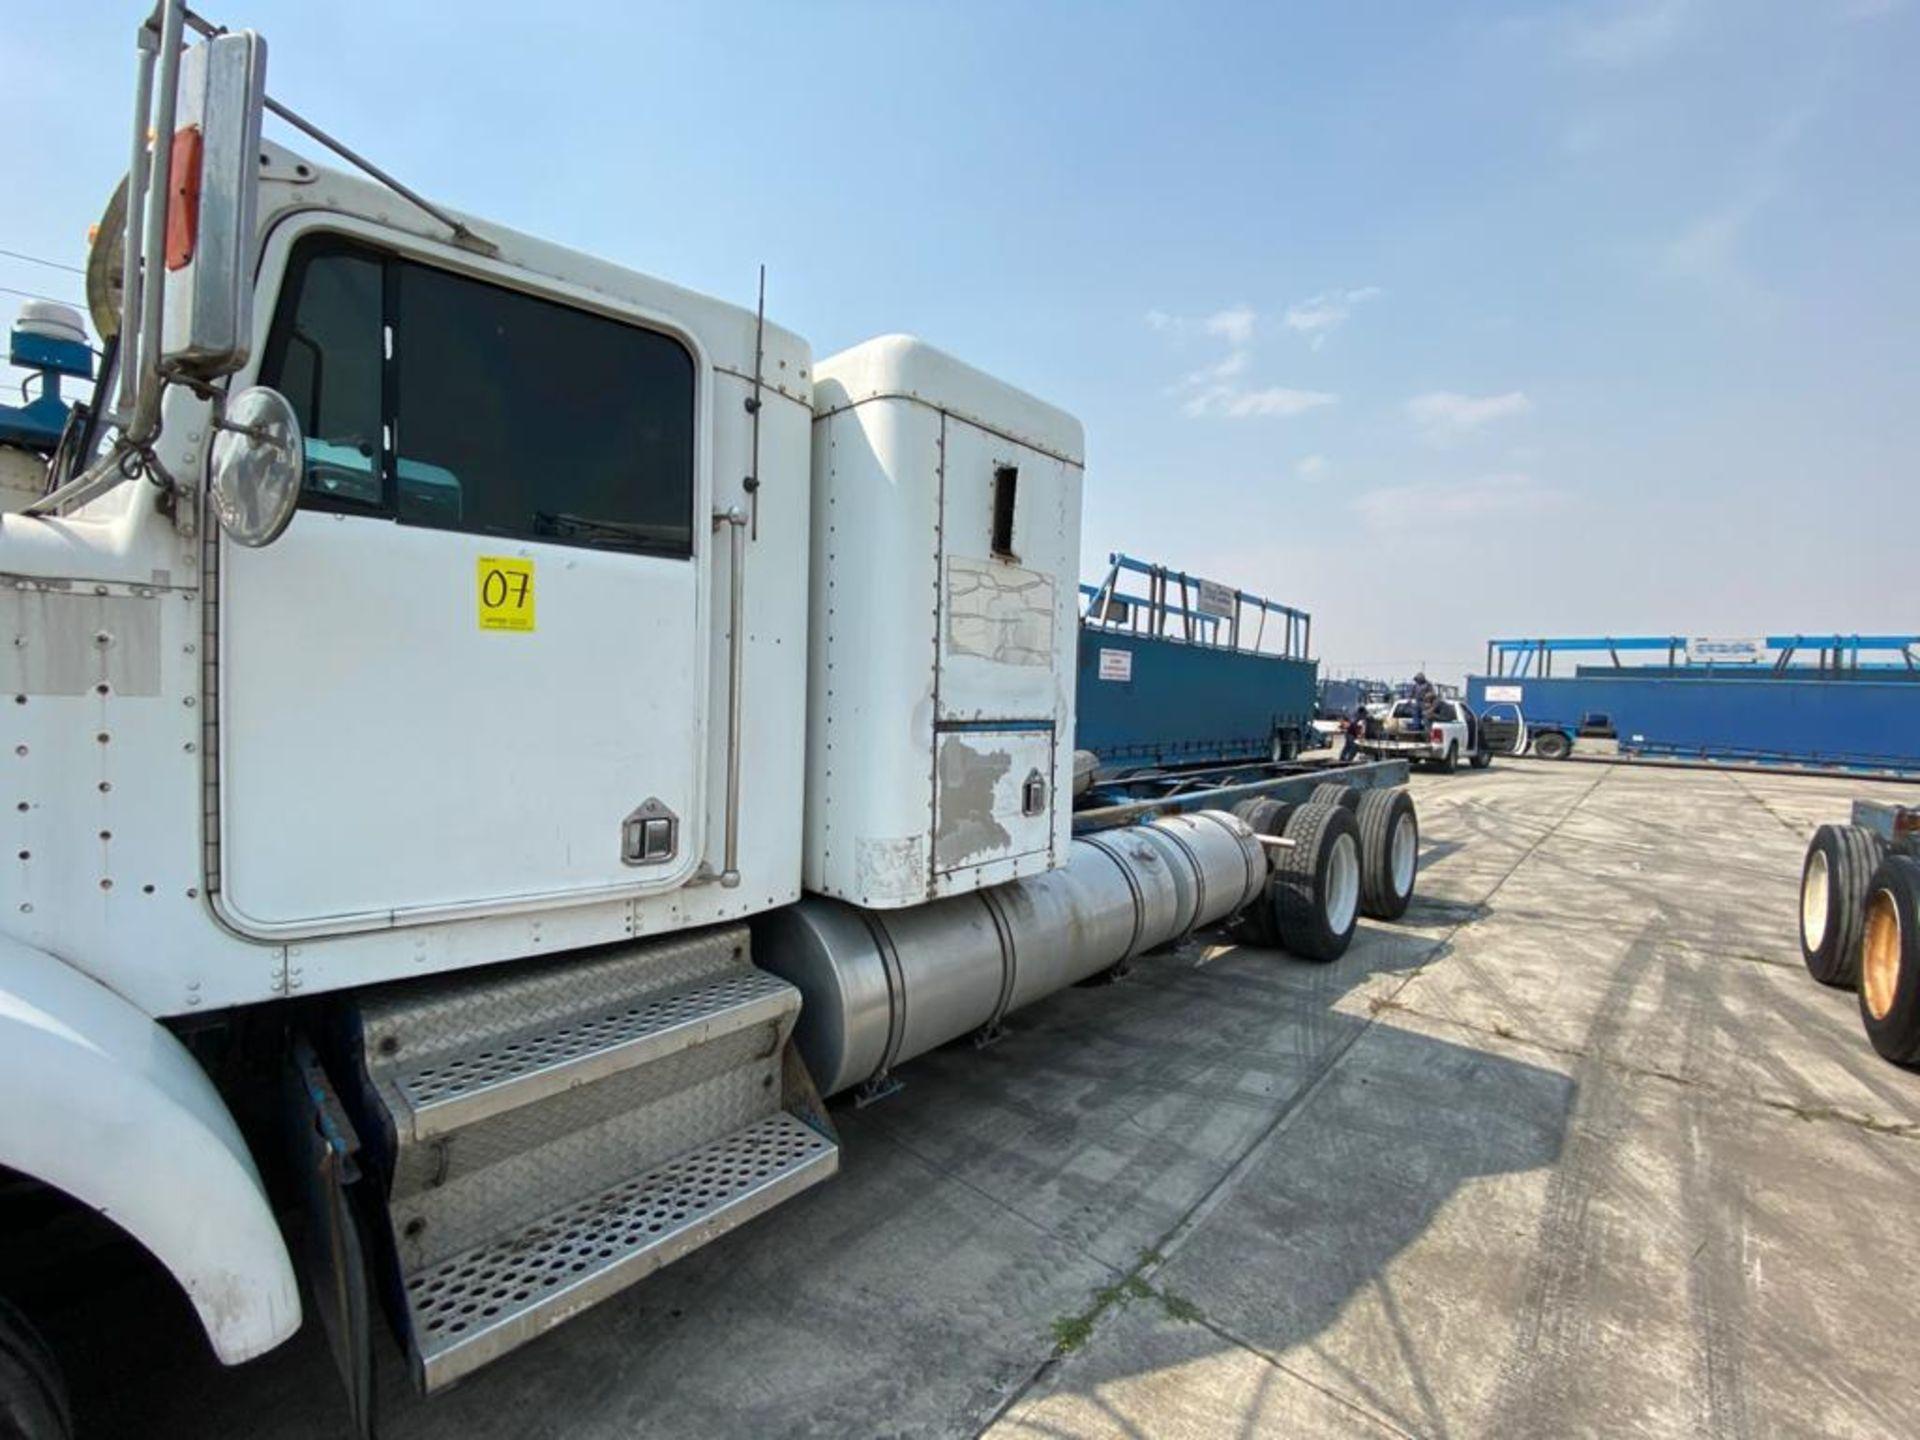 1999 Kenworth Sleeper truck tractor, standard transmission of 18 speeds - Image 10 of 72